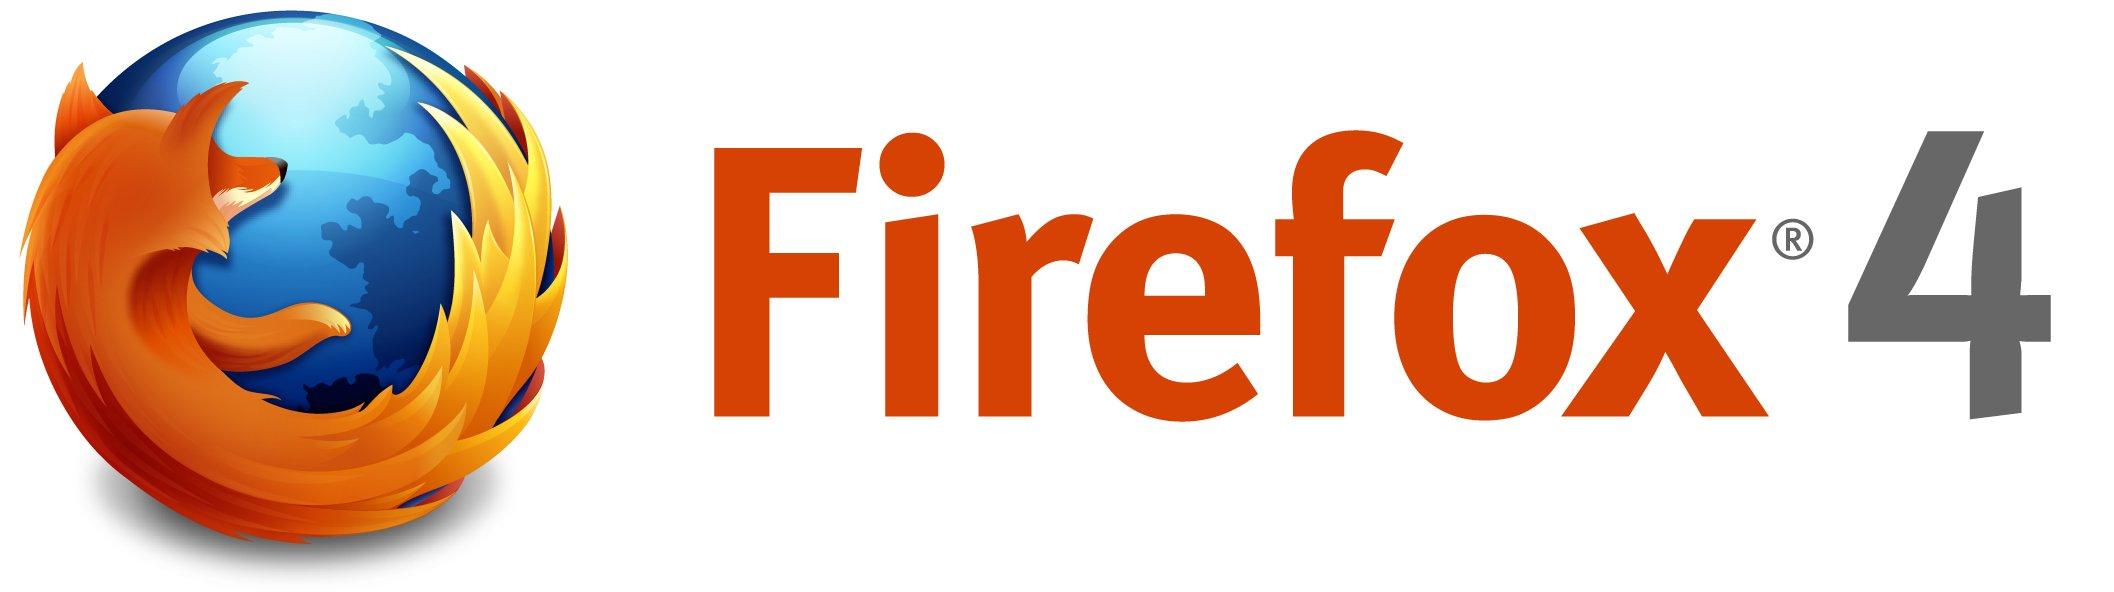 logo-wordmark-version-4